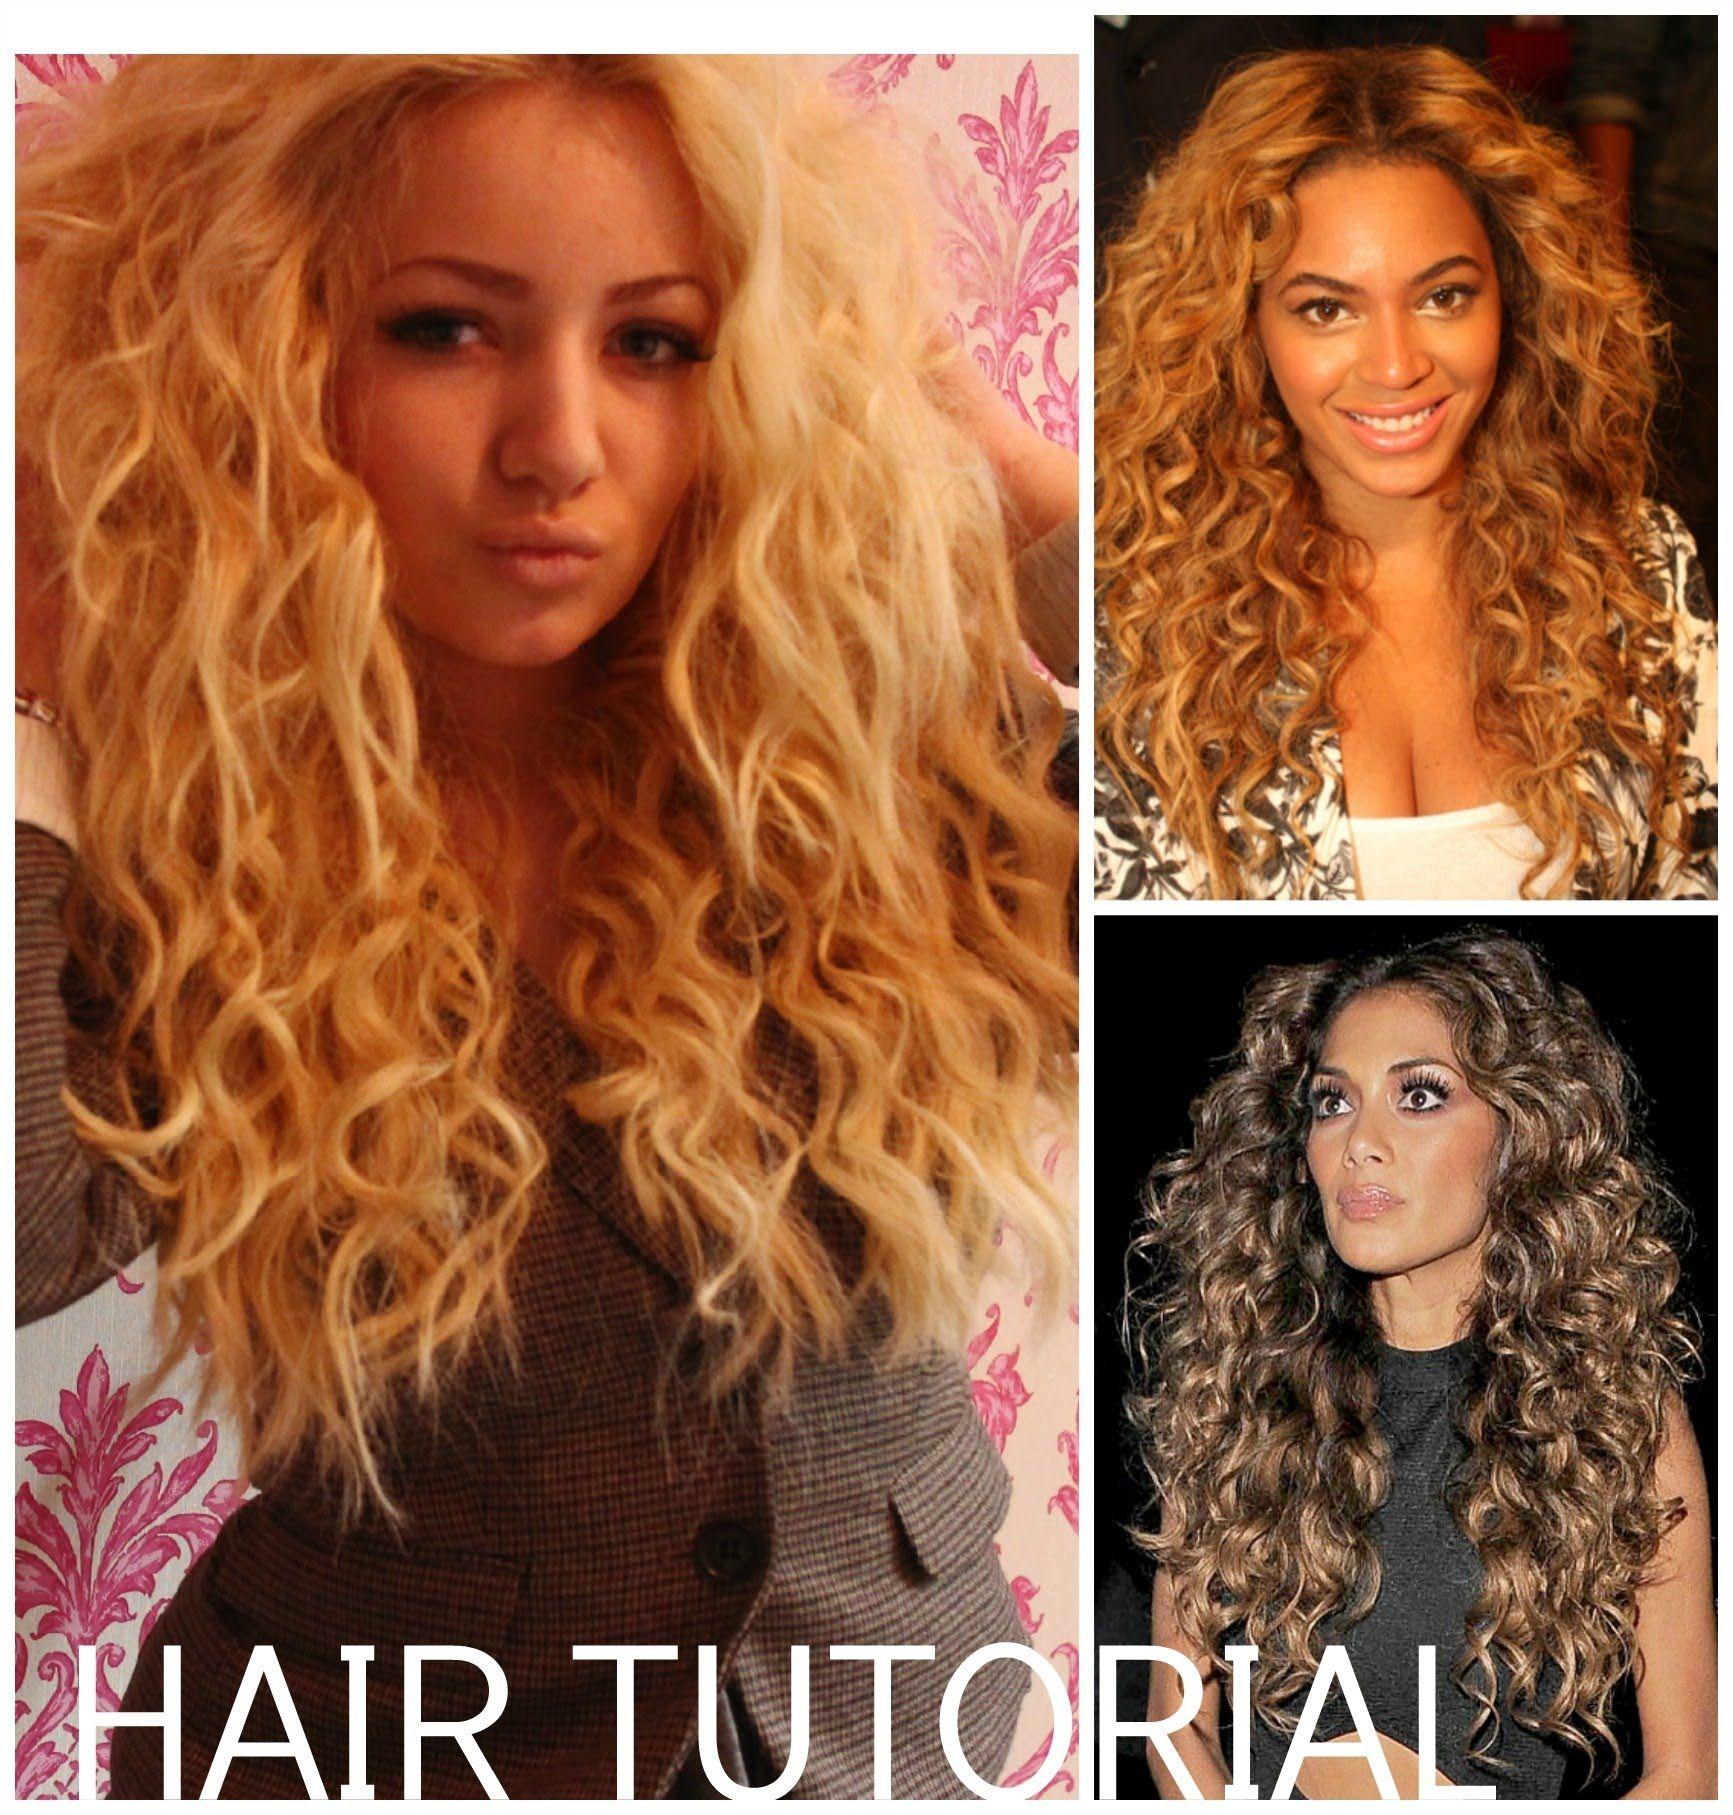 ... curly hair tutorial witch hair nicole scherzinger curls hair beyonce